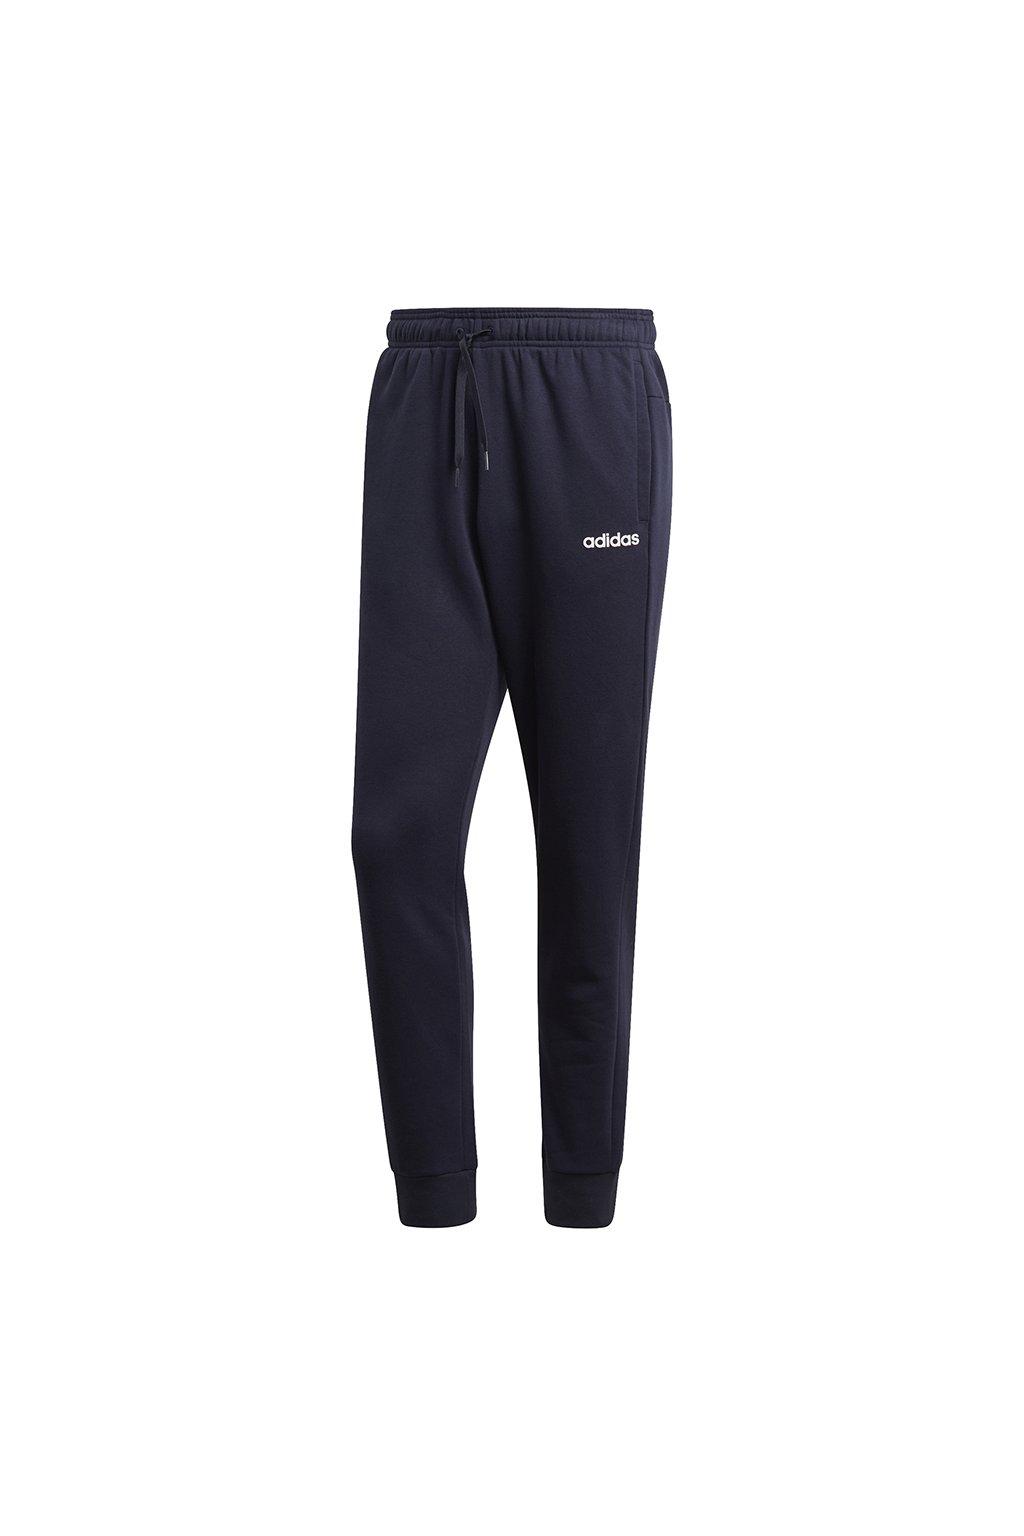 Pánske tepláky Adidas Essentials Plain Pants FL tmavo modré DU0376